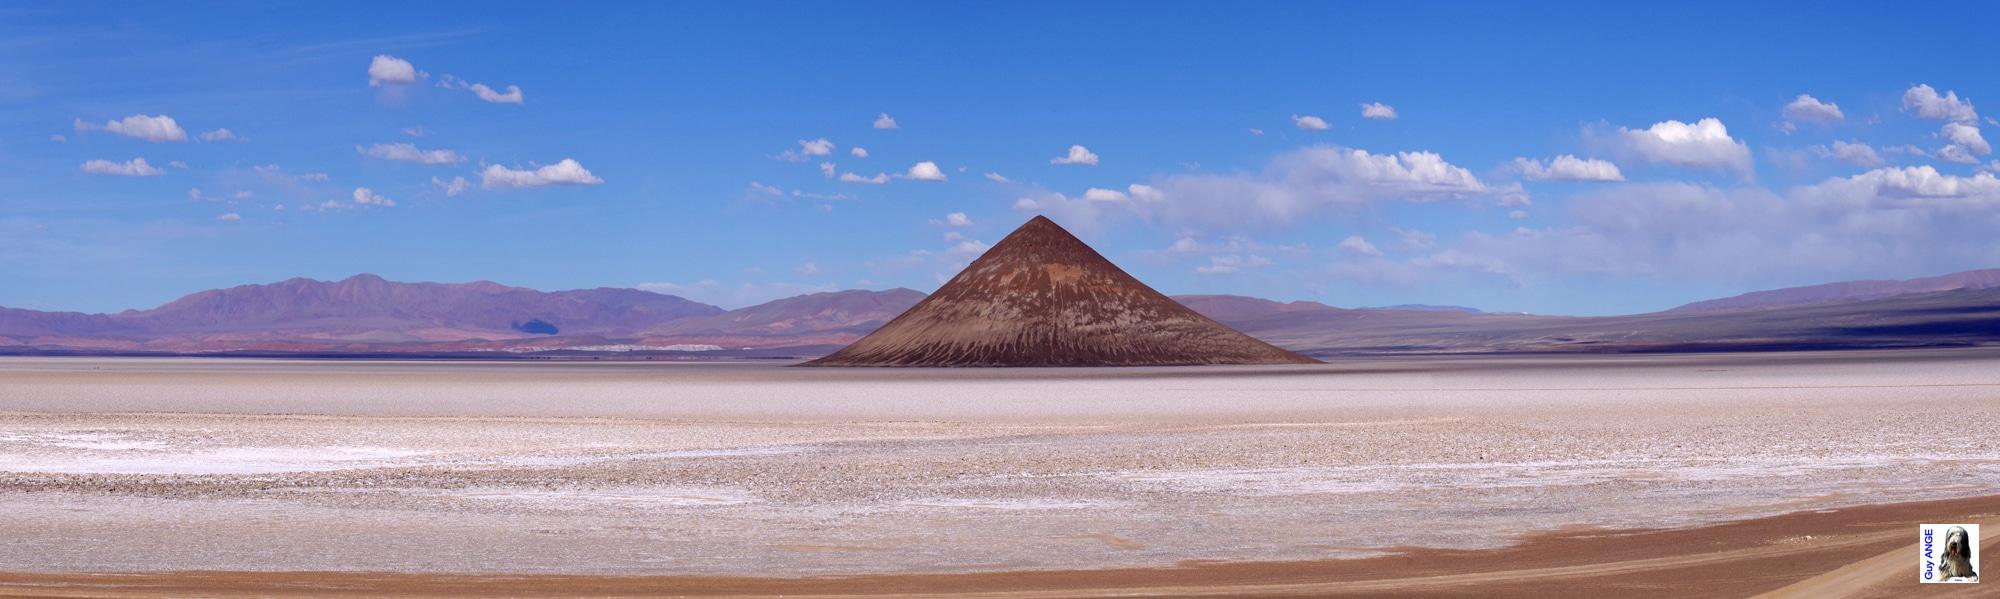 Argentine. Le cône d'Arita dans le salar d'Arizaro.